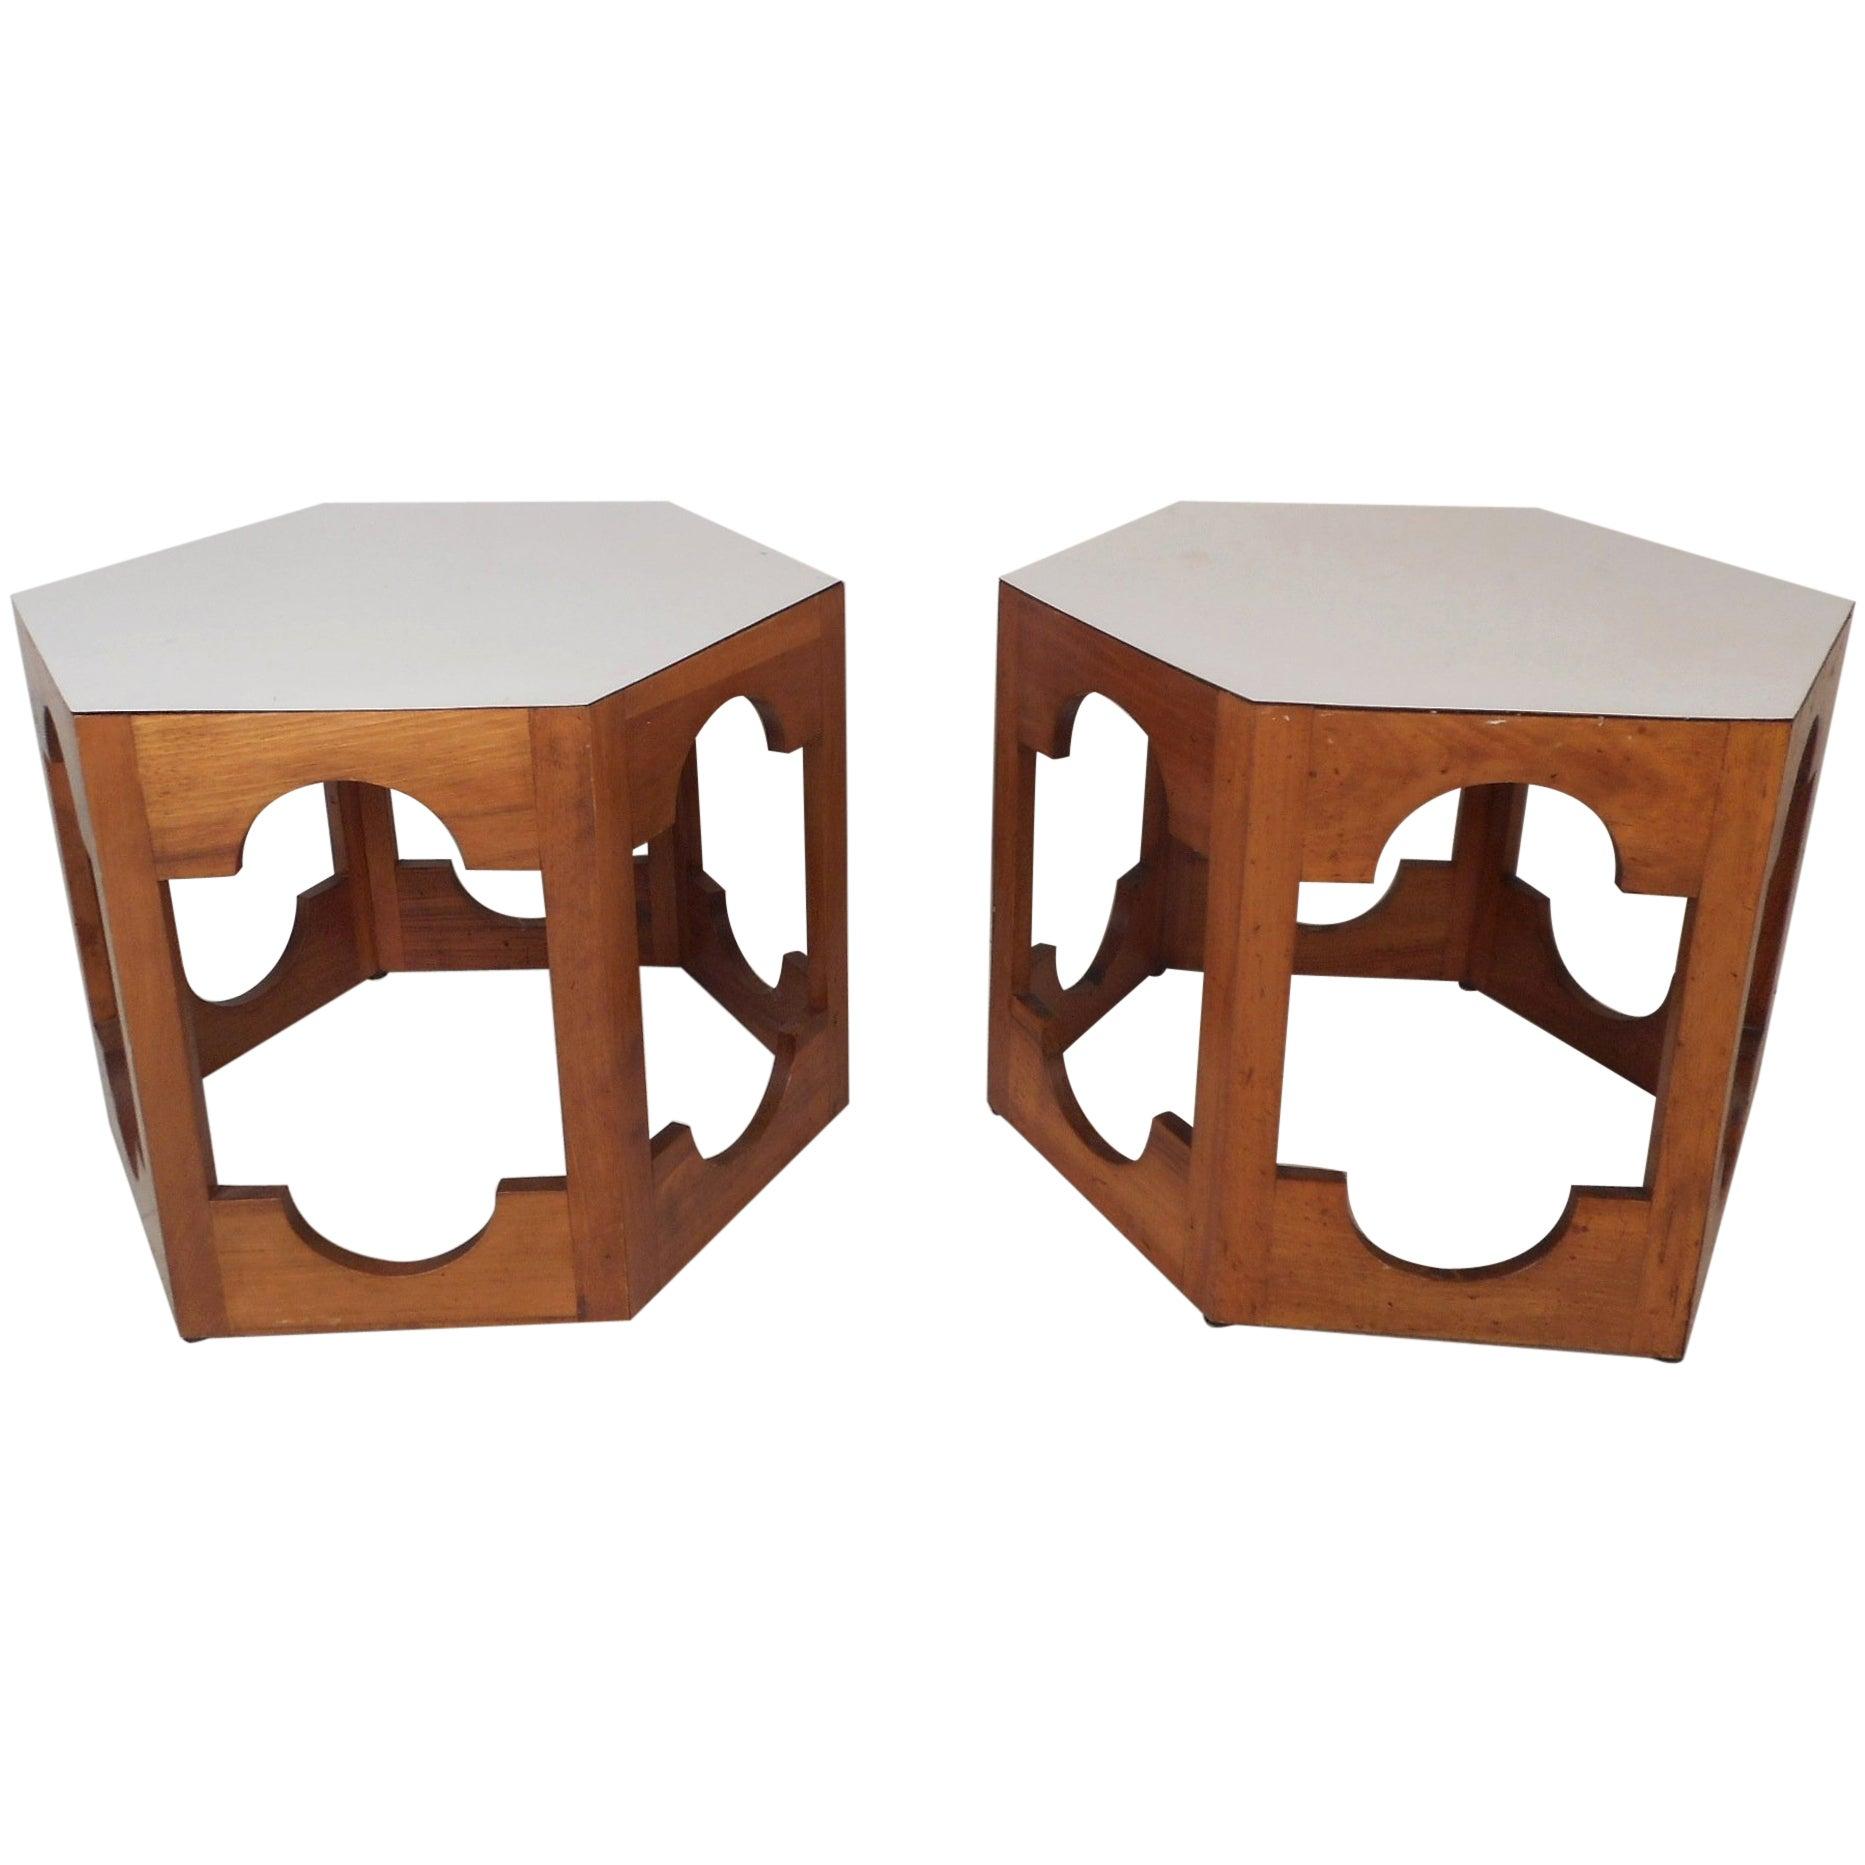 Pair of Mid-Century Modern Italian Hexagonal End Tables